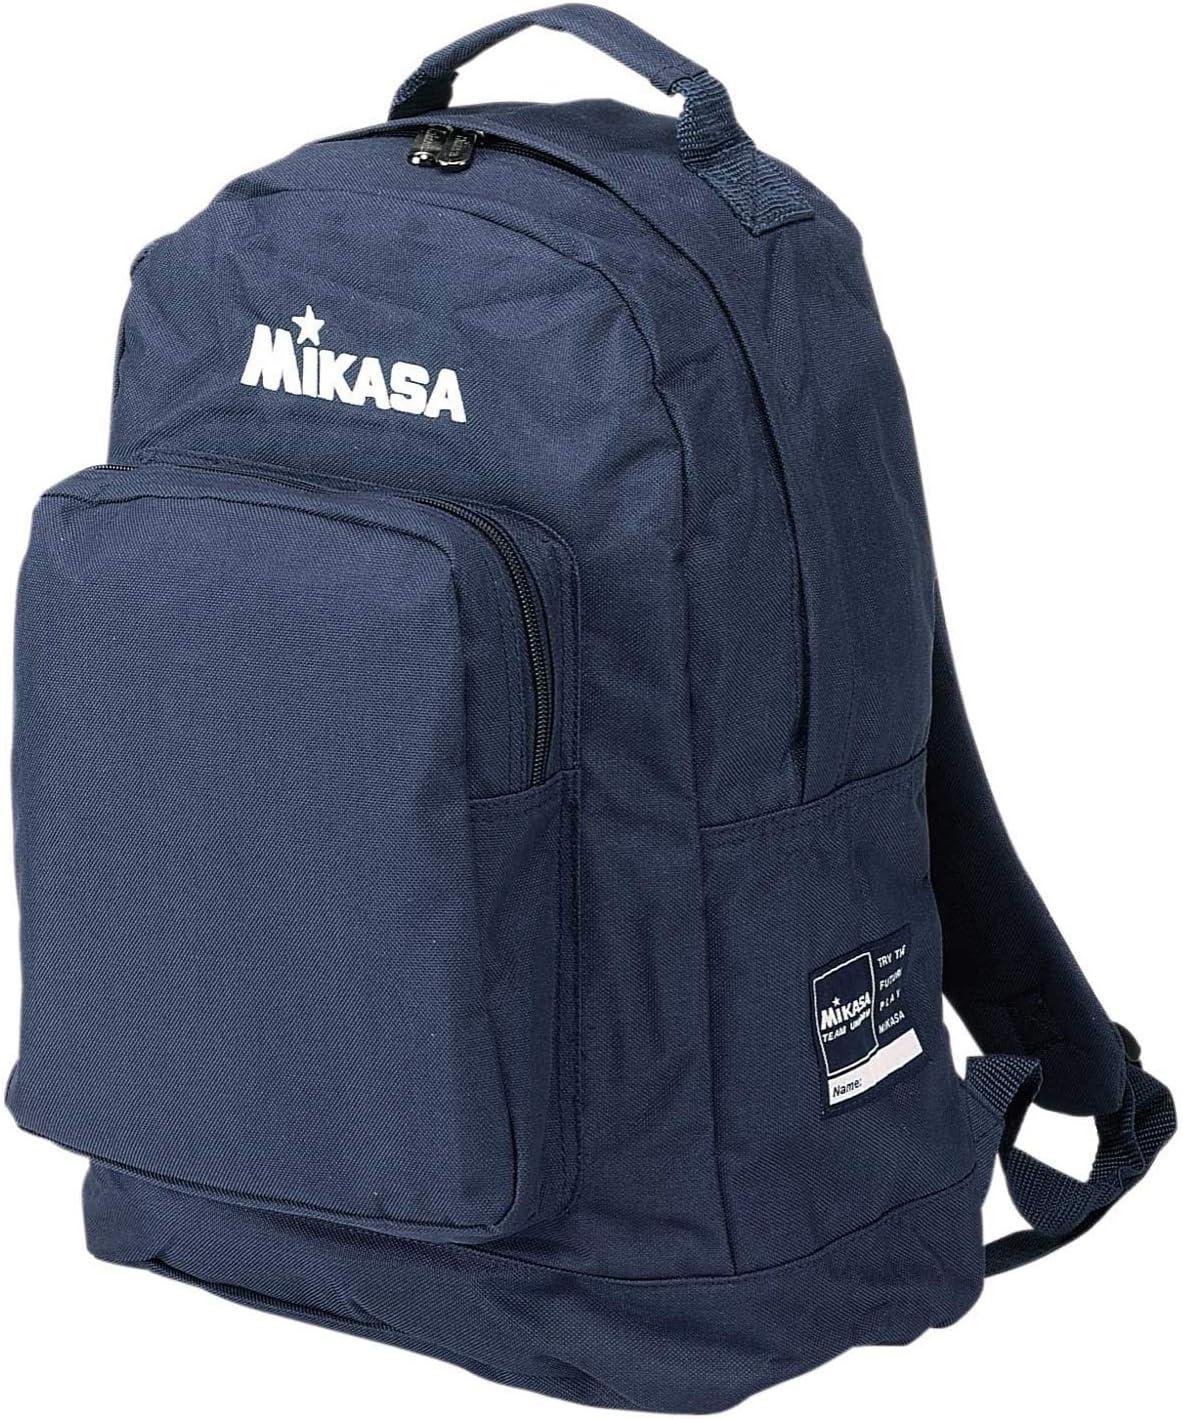 MIKASA MT58 Sac de Sport pour Volleyball